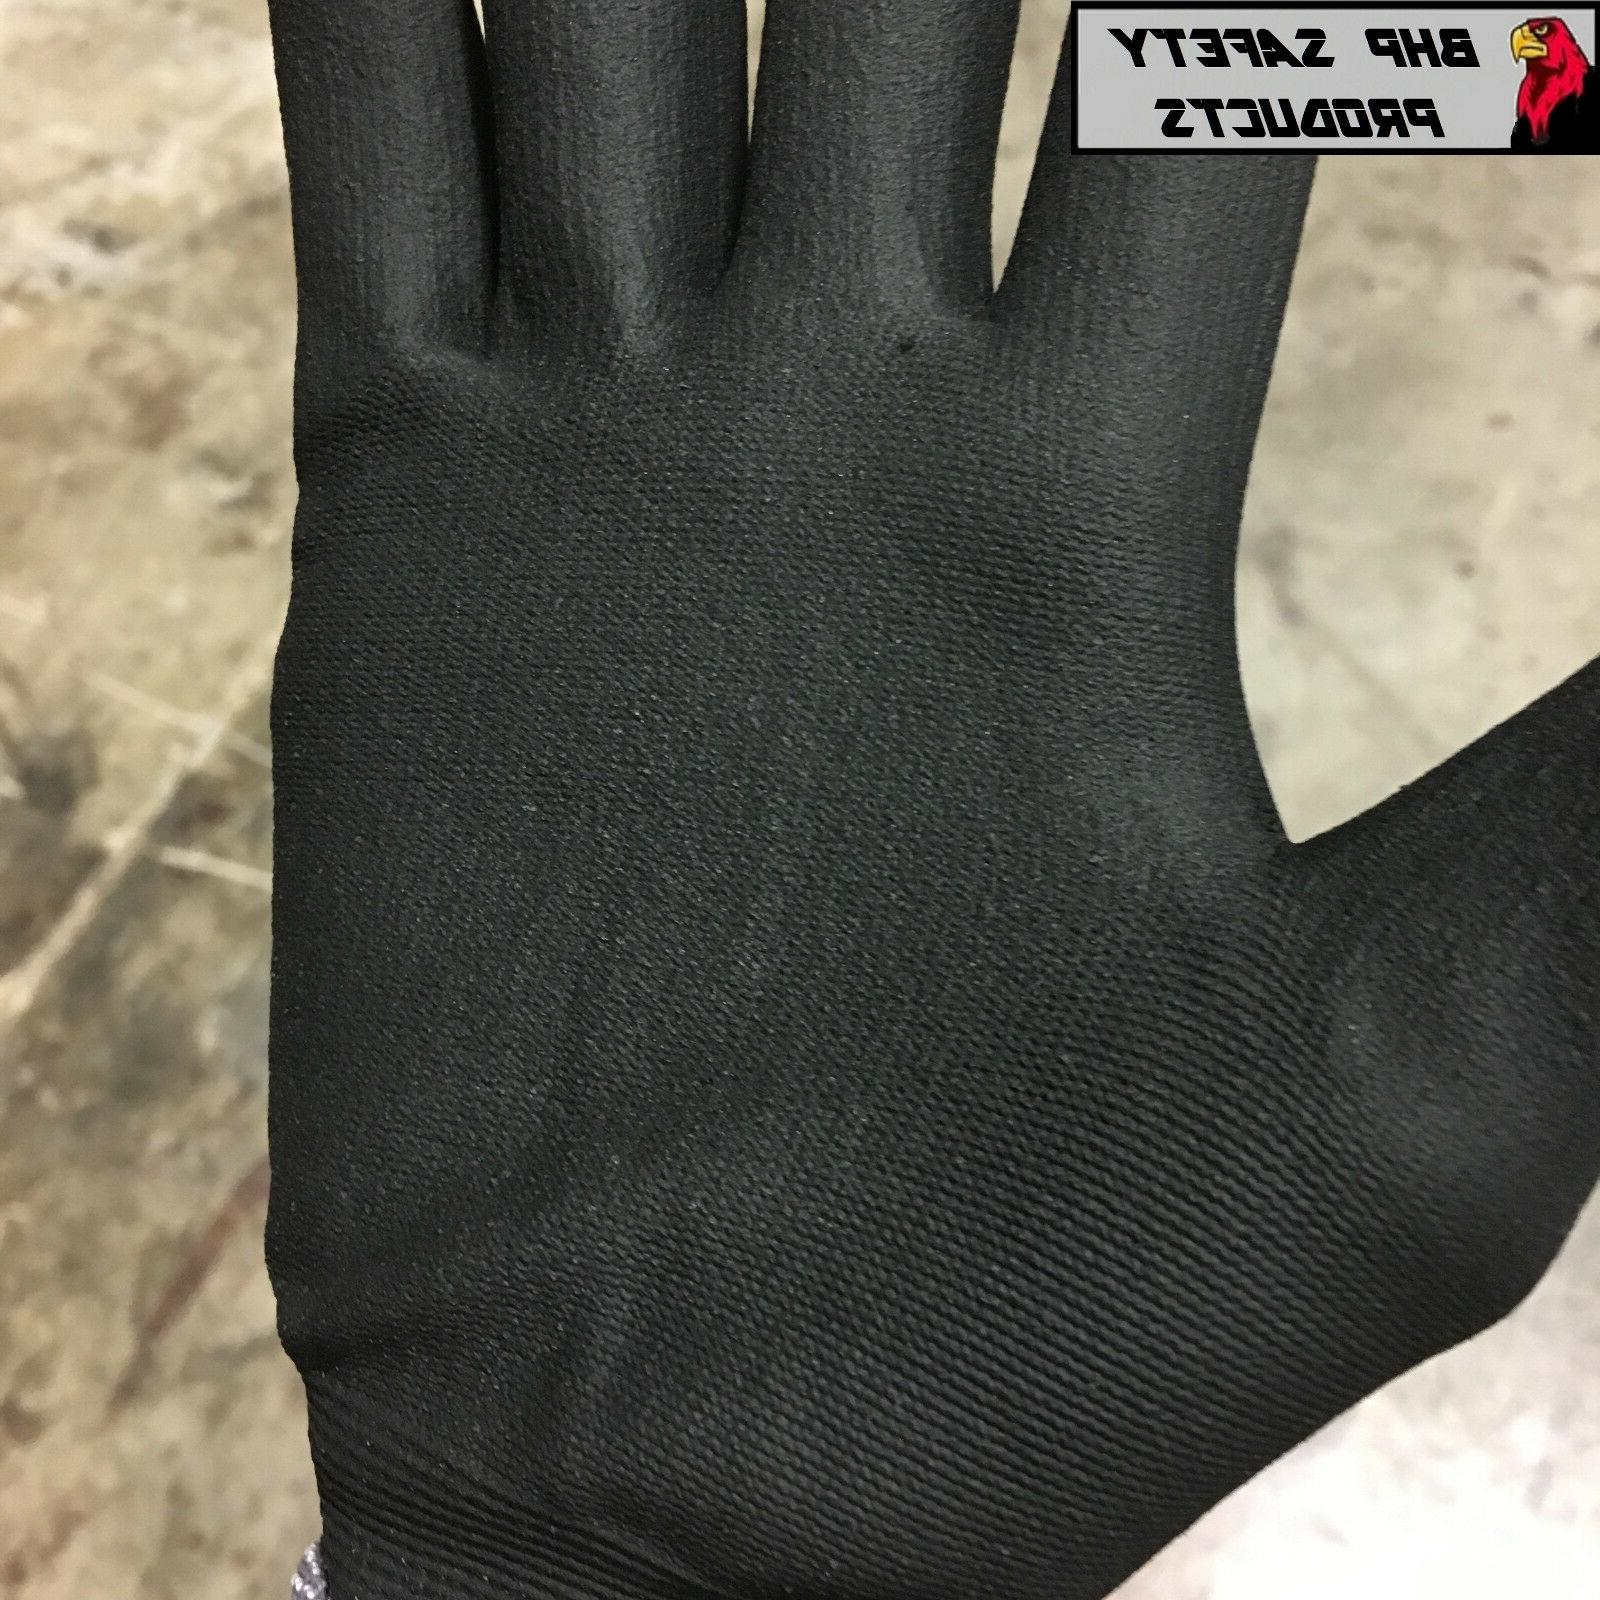 Work Liberty G-Grip Foam Nitrile Foam-Palm Coated